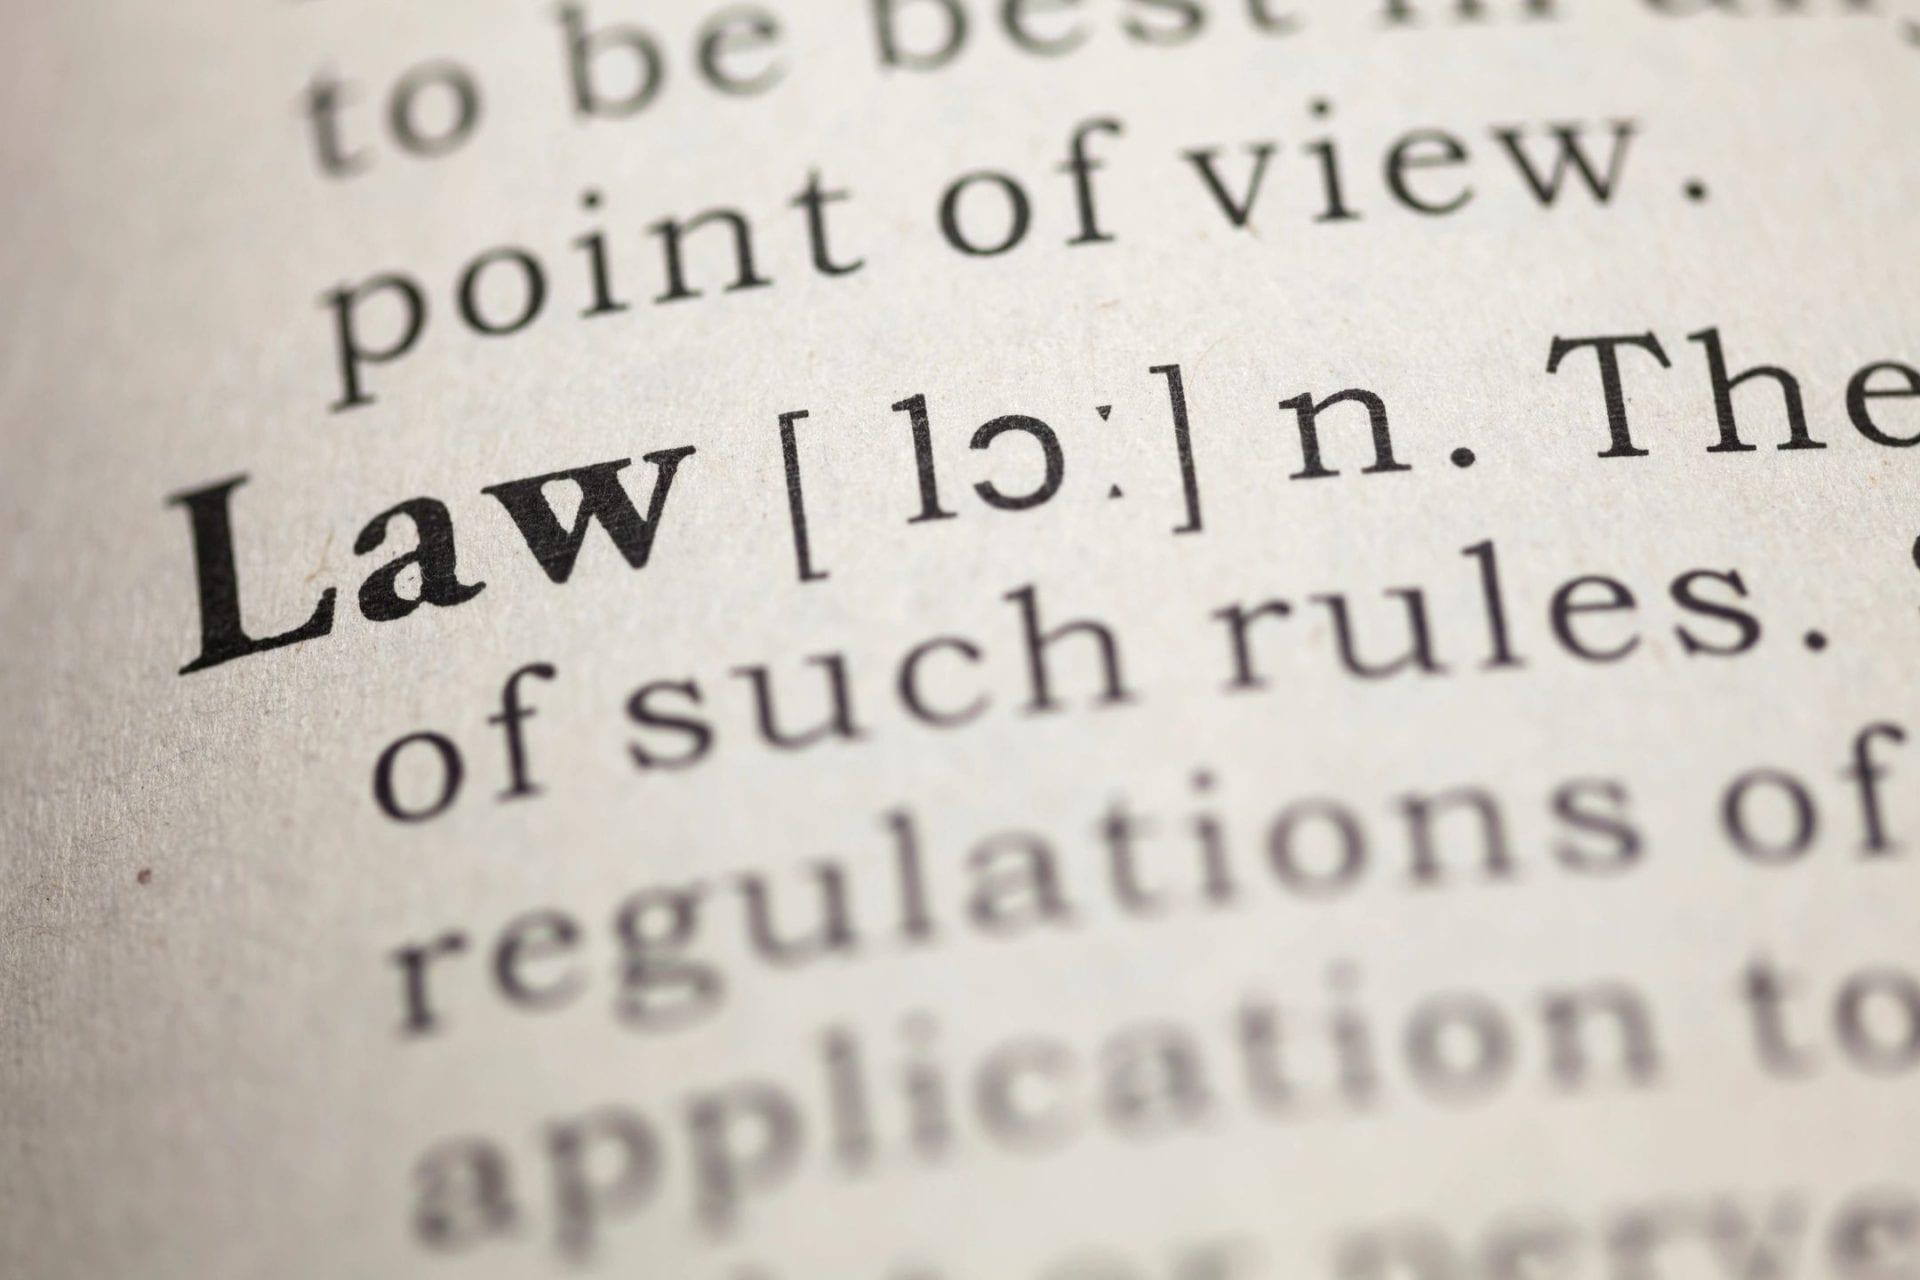 Raiford Law, PLLC